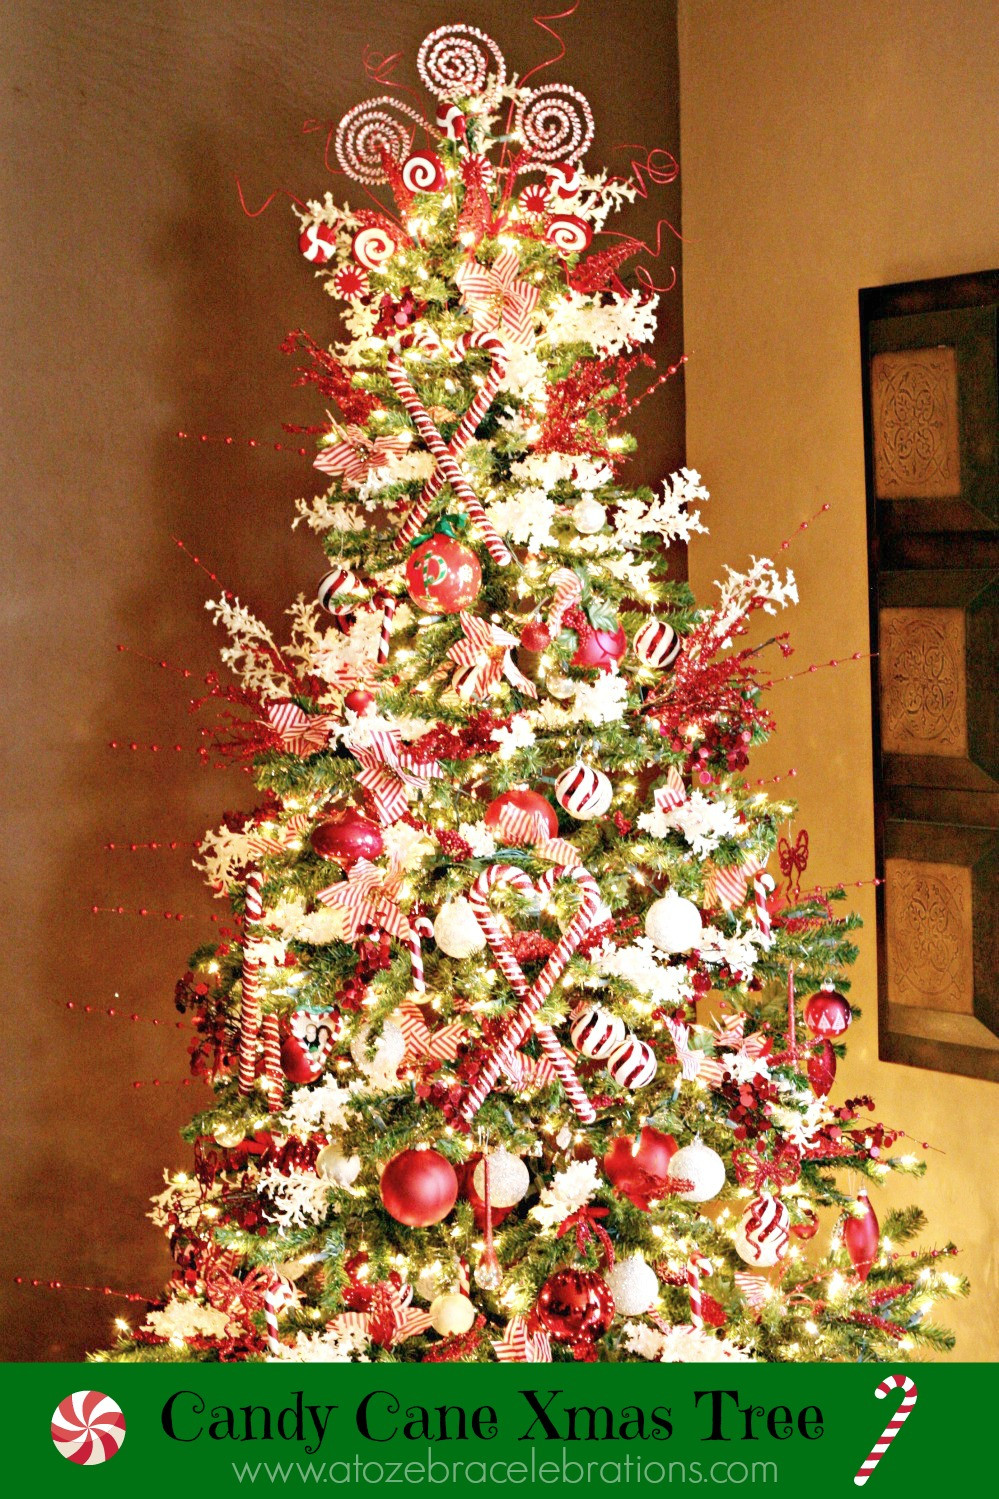 Candy Cane Christmas Tree  Christmas Tree 2012 – A to Zebra Celebrations